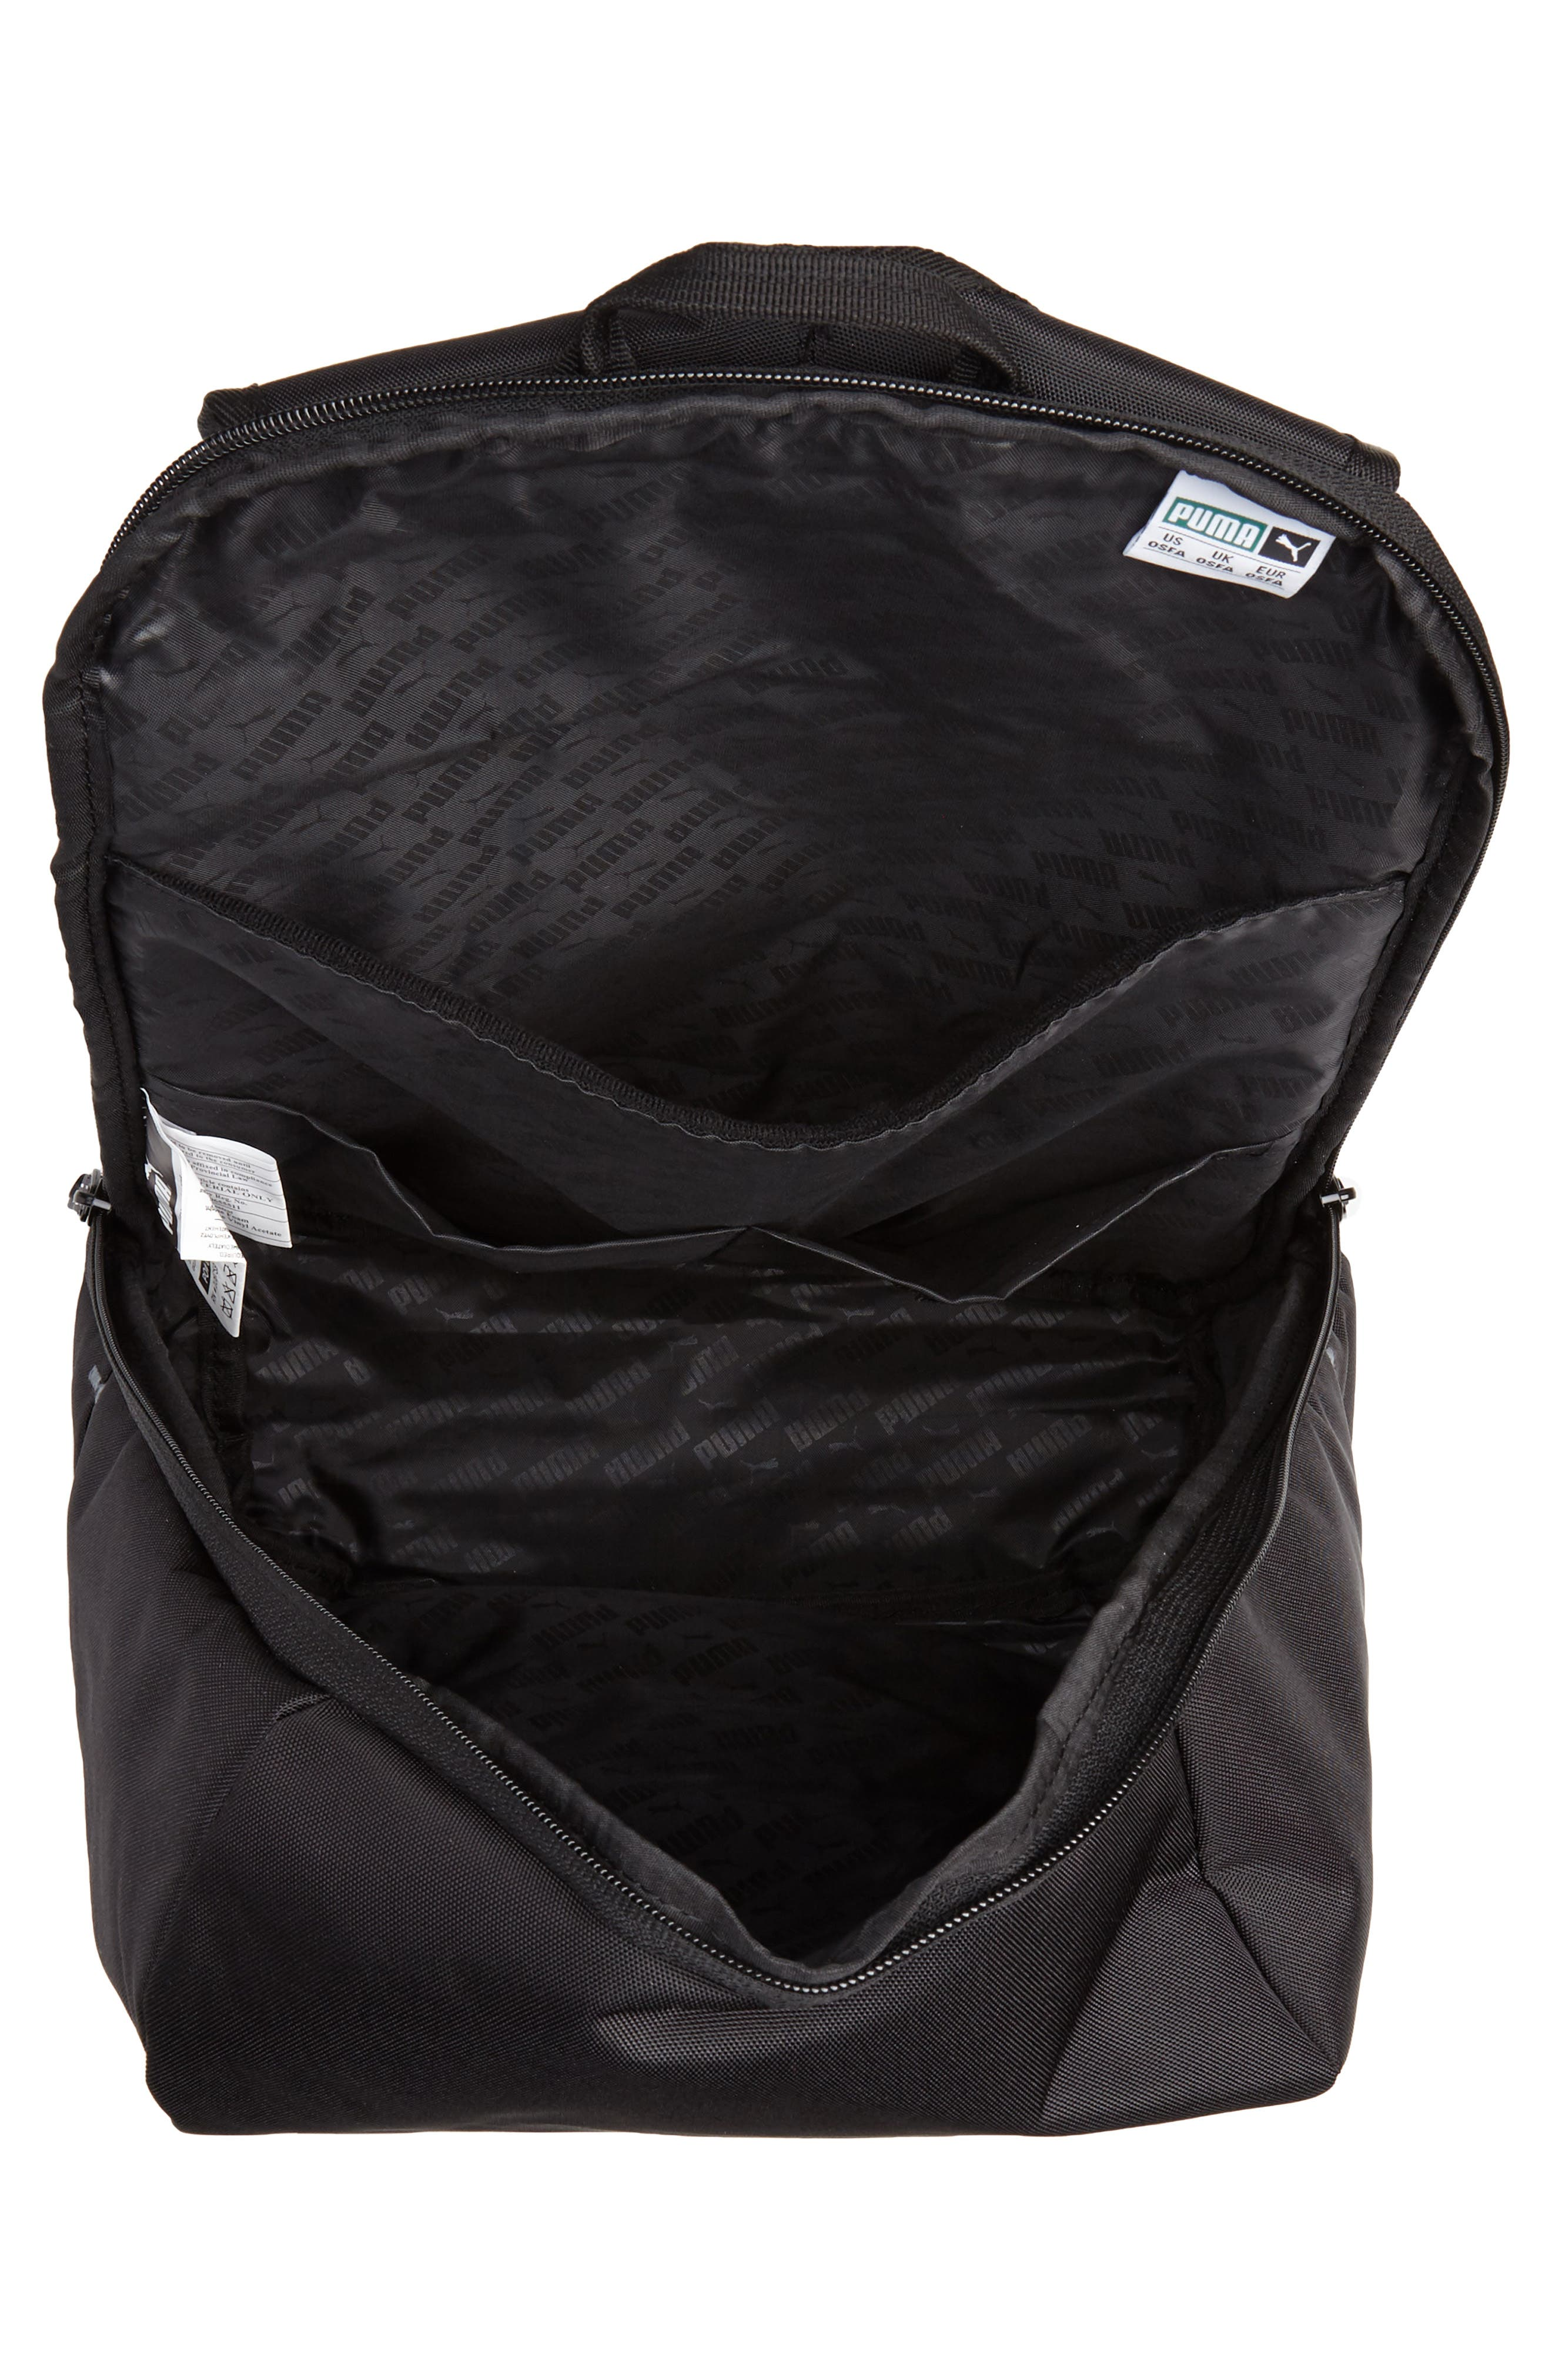 Ace Backpack,                             Alternate thumbnail 4, color,                             BLACK